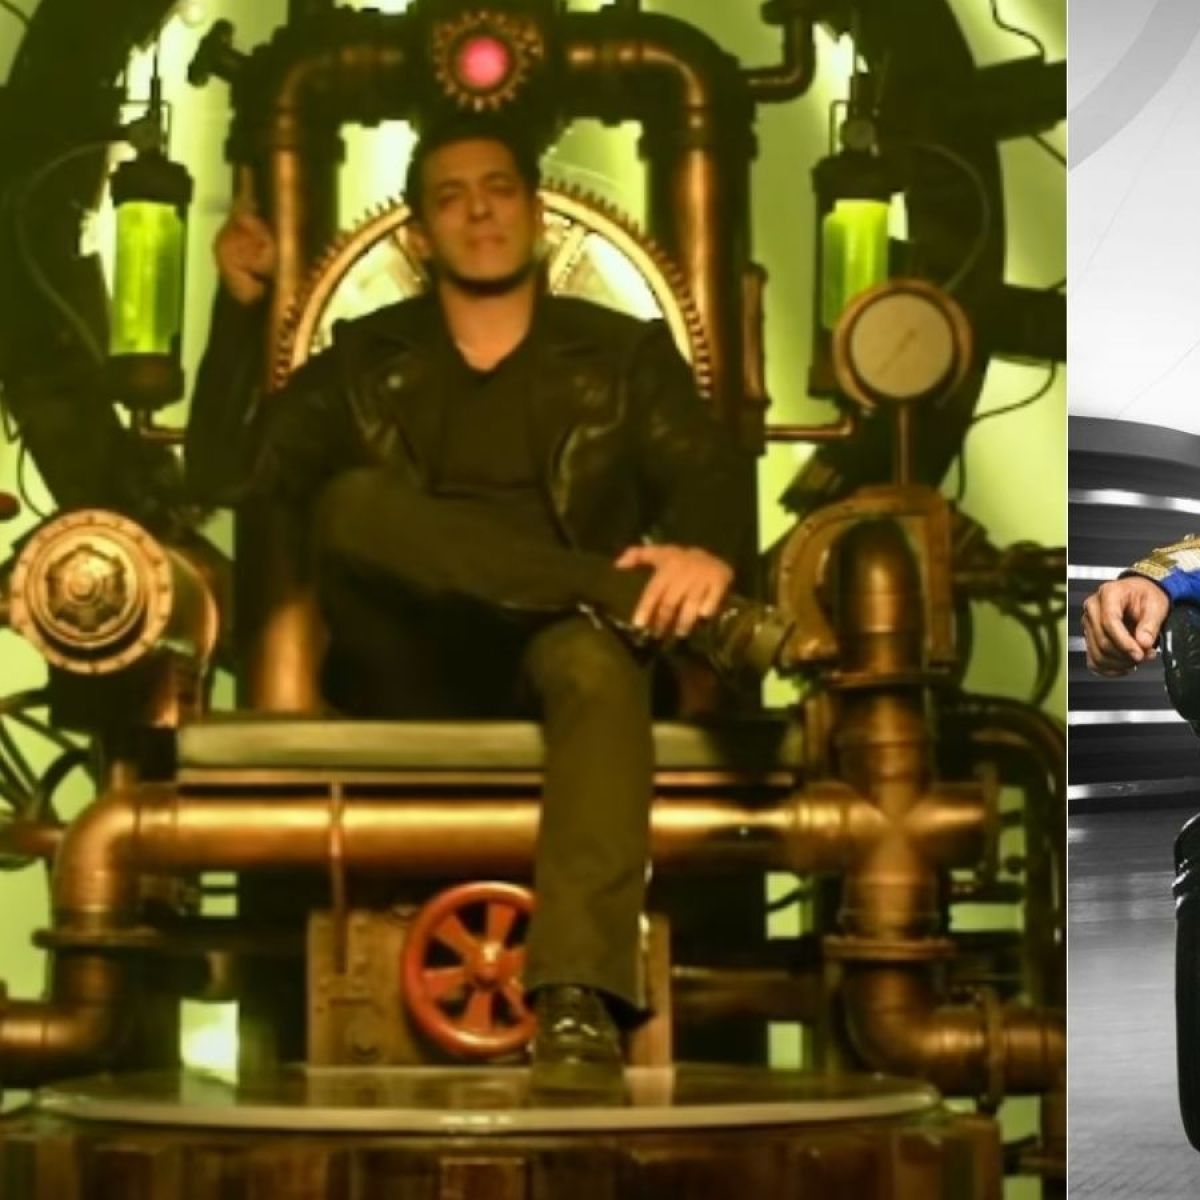 Radhe Trailer: Netizens unhappy with Salman Khan 'stealing' Allu Arjun's song 'Seetimaar'